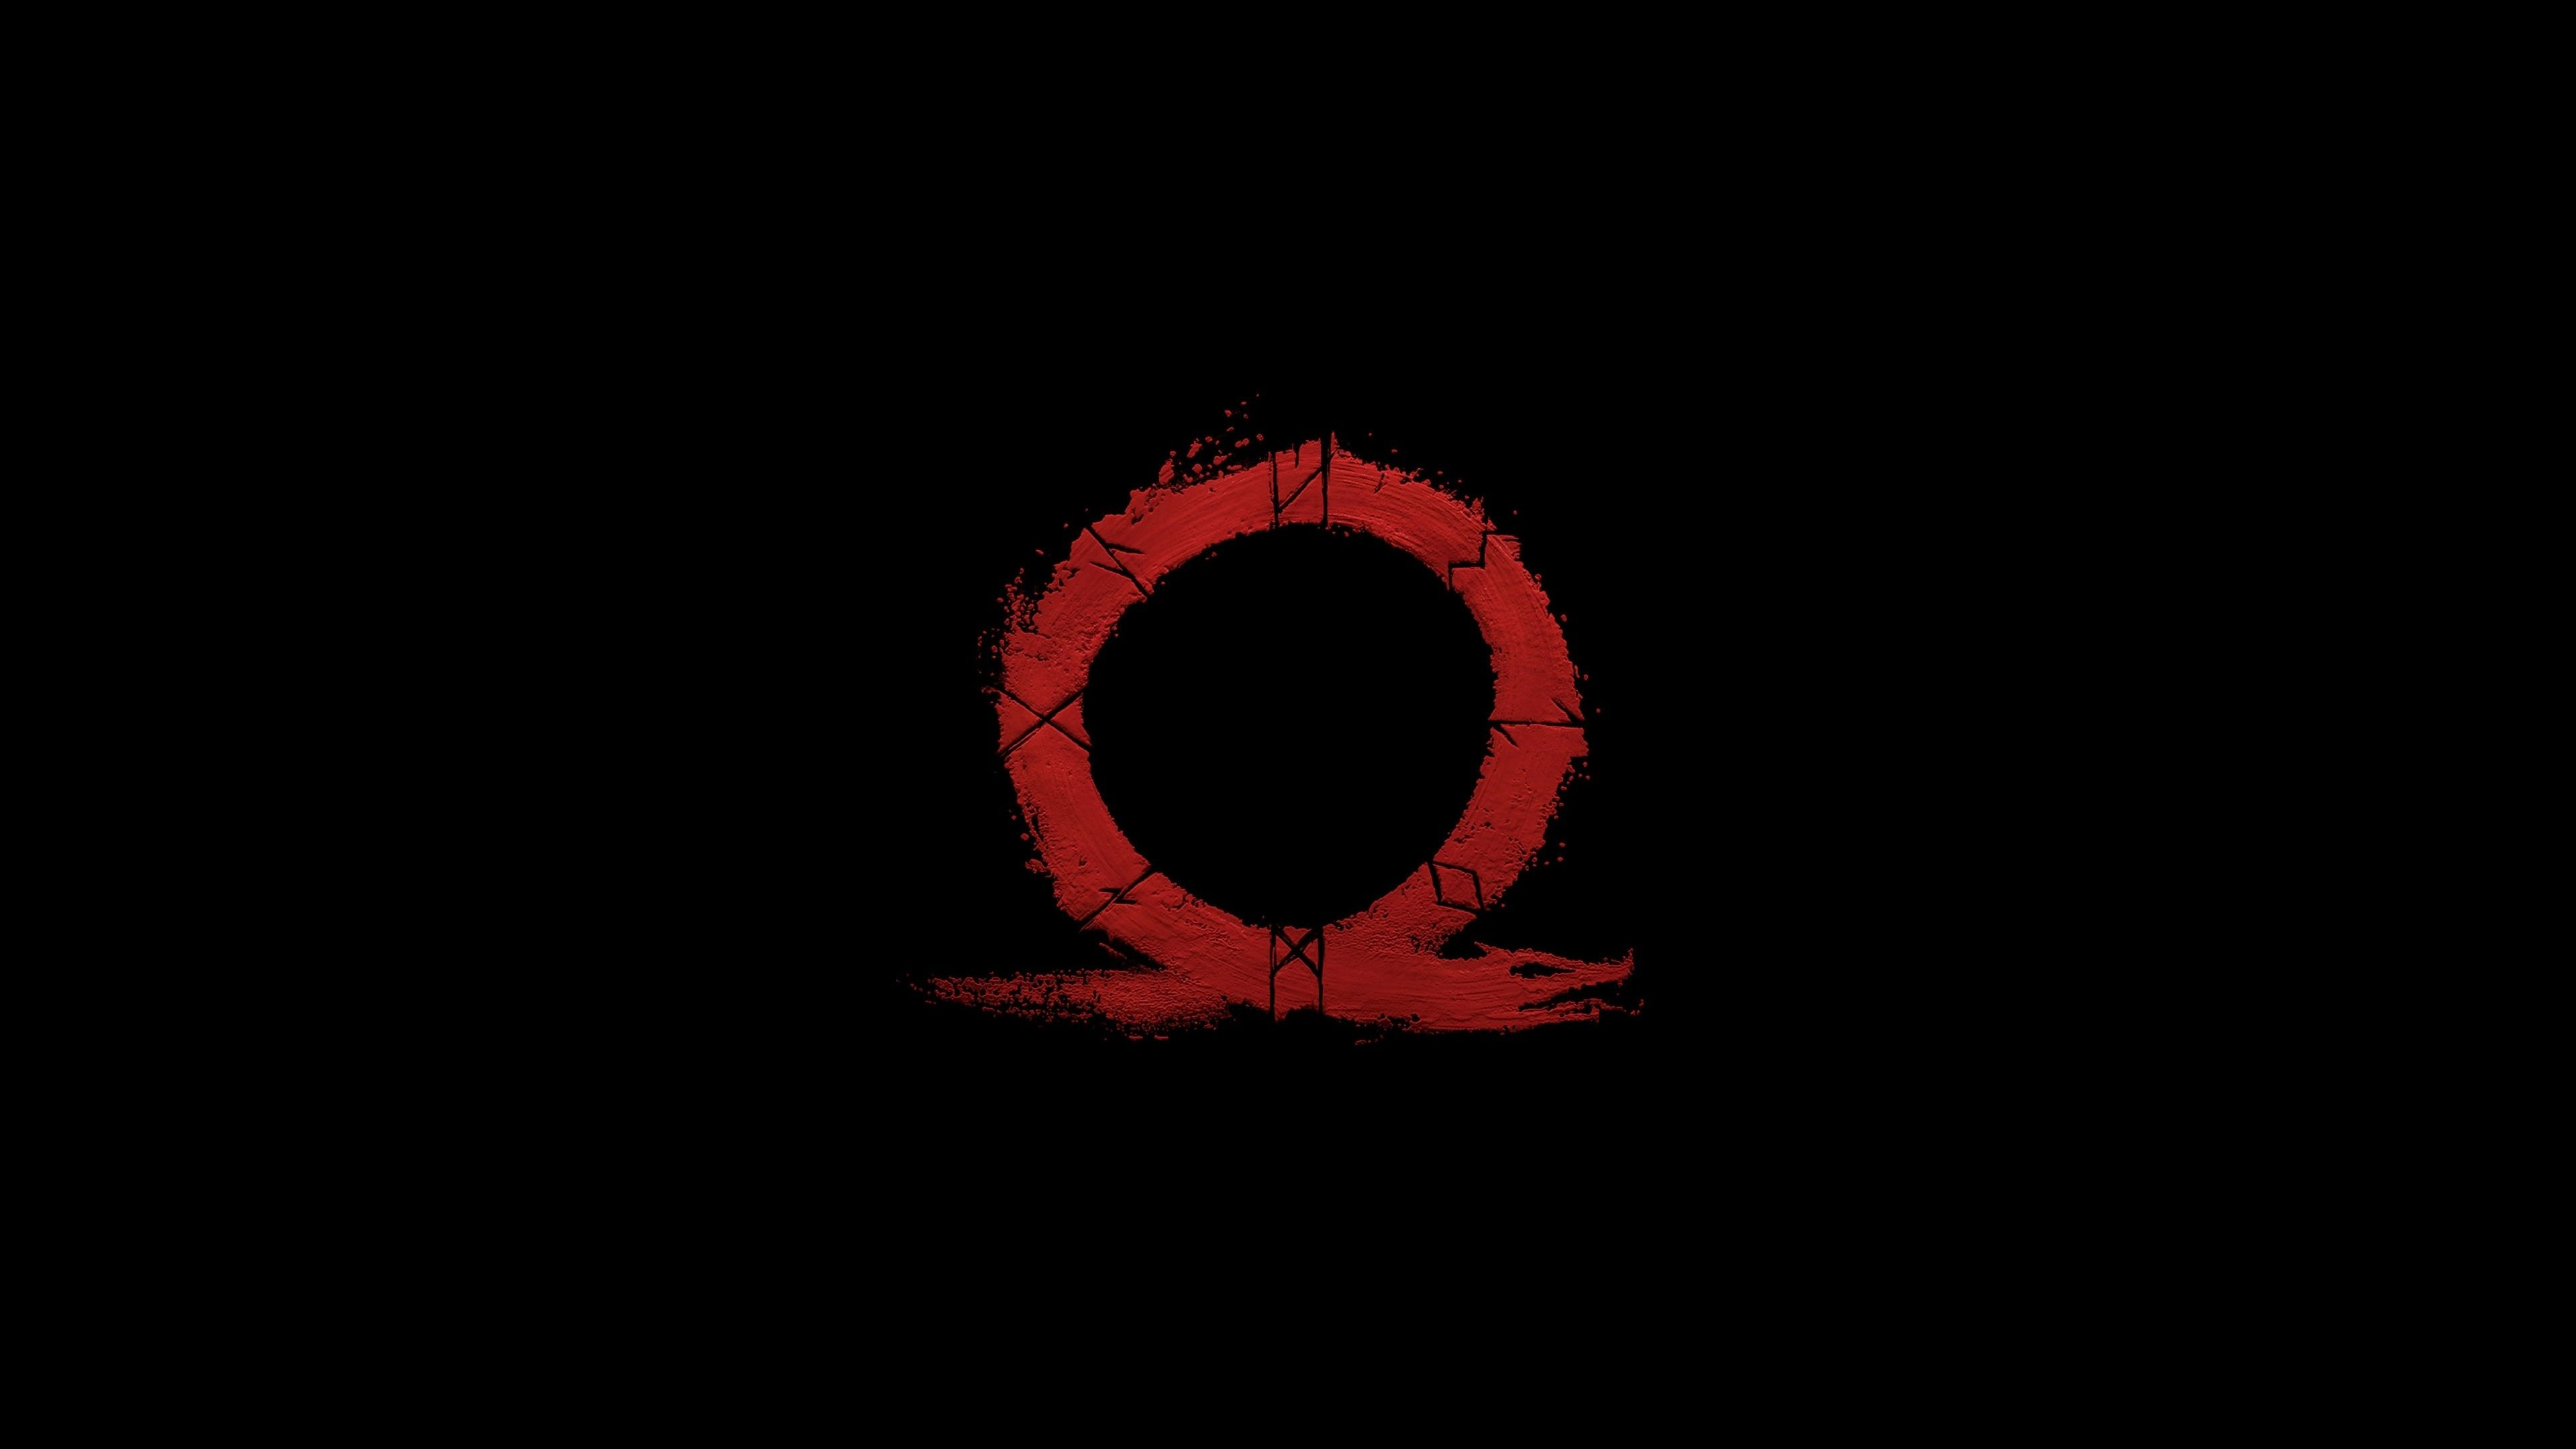 God Of War Omega Logo 4k